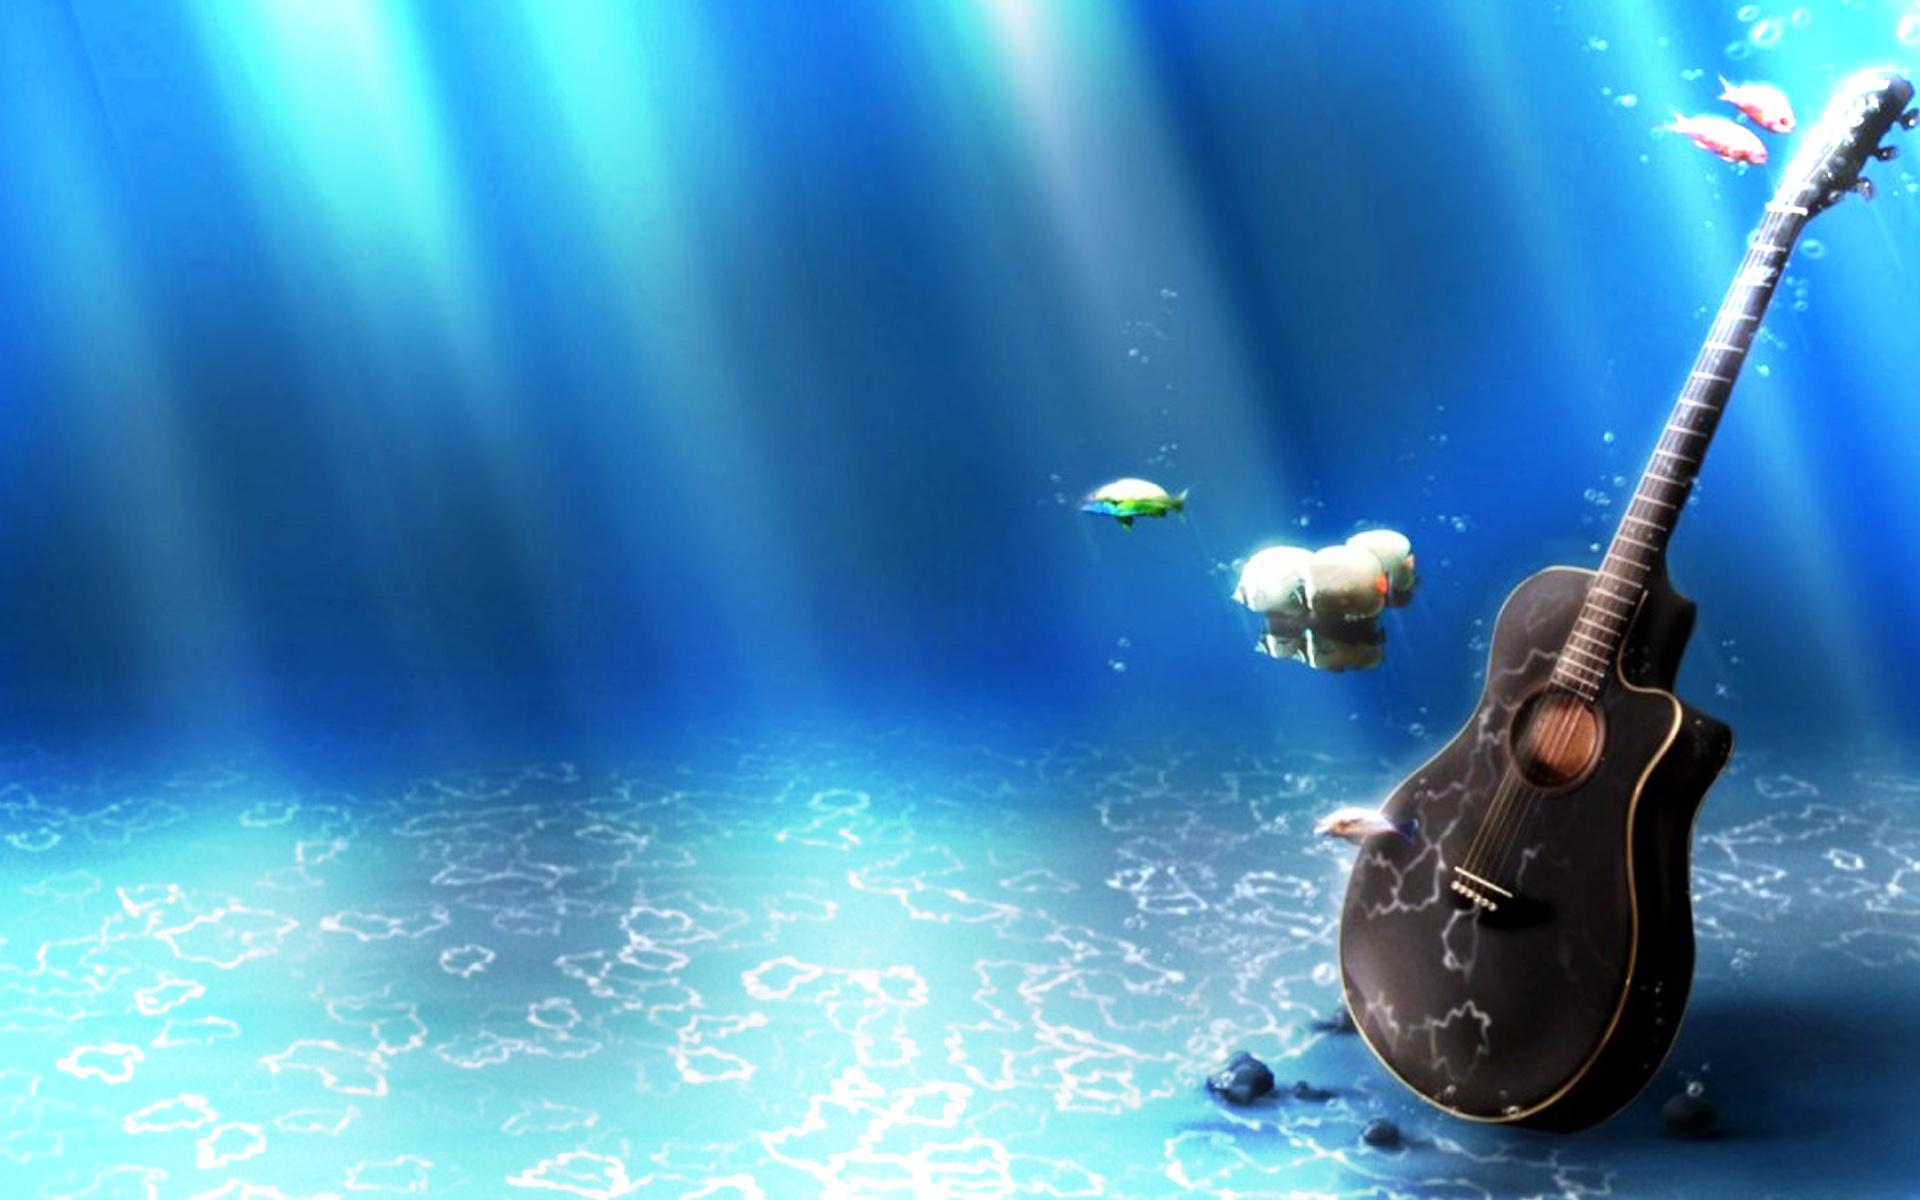 adenan hd wallpaper underwater - photo #42